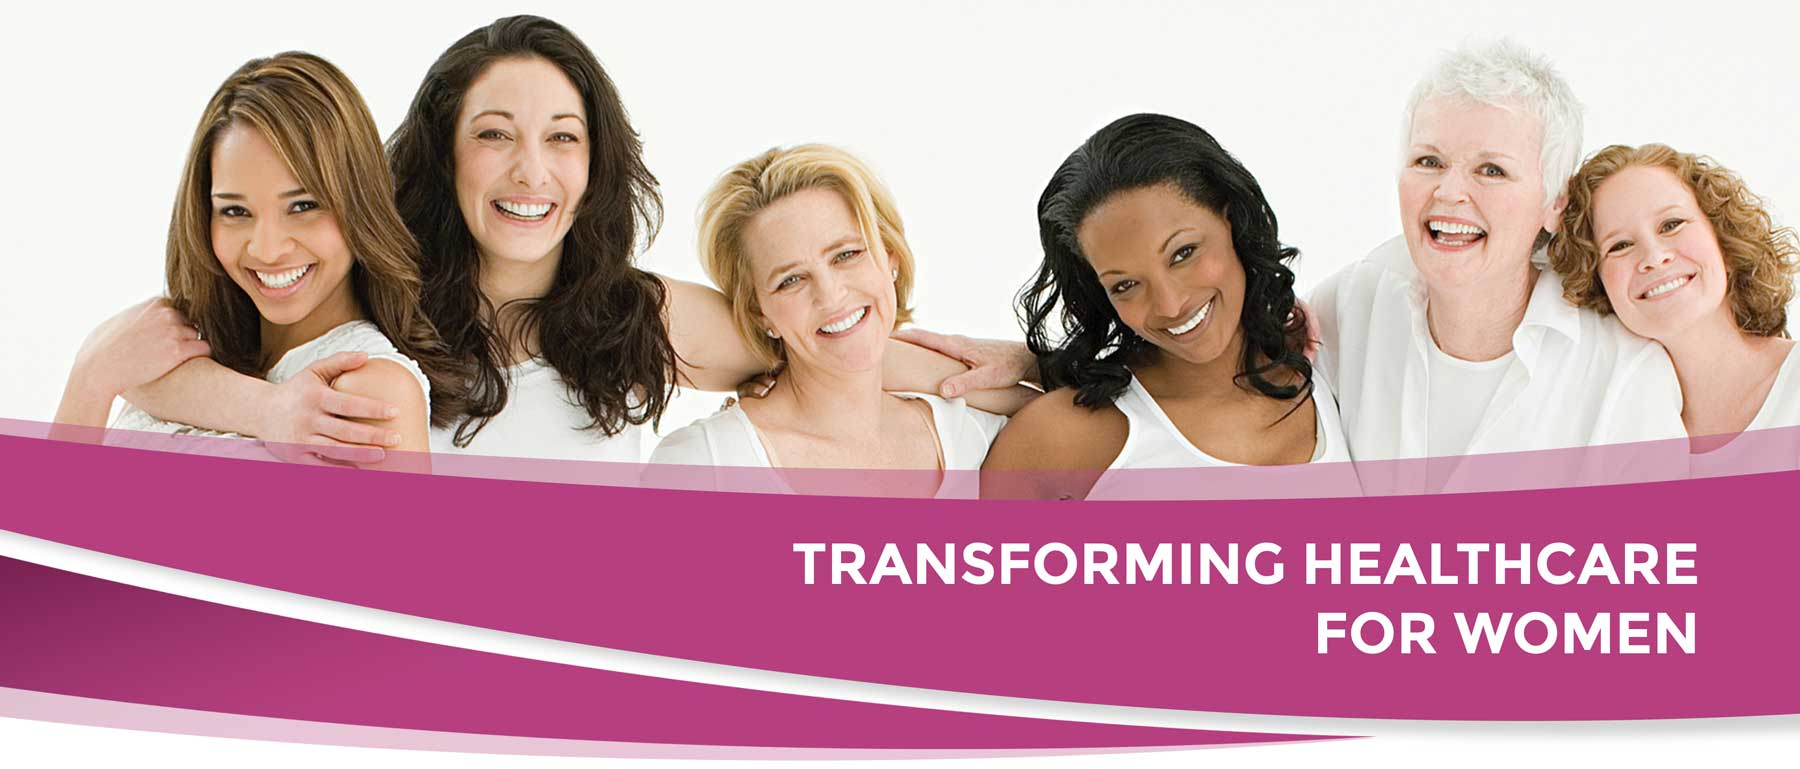 Transforming Healthcare for Women